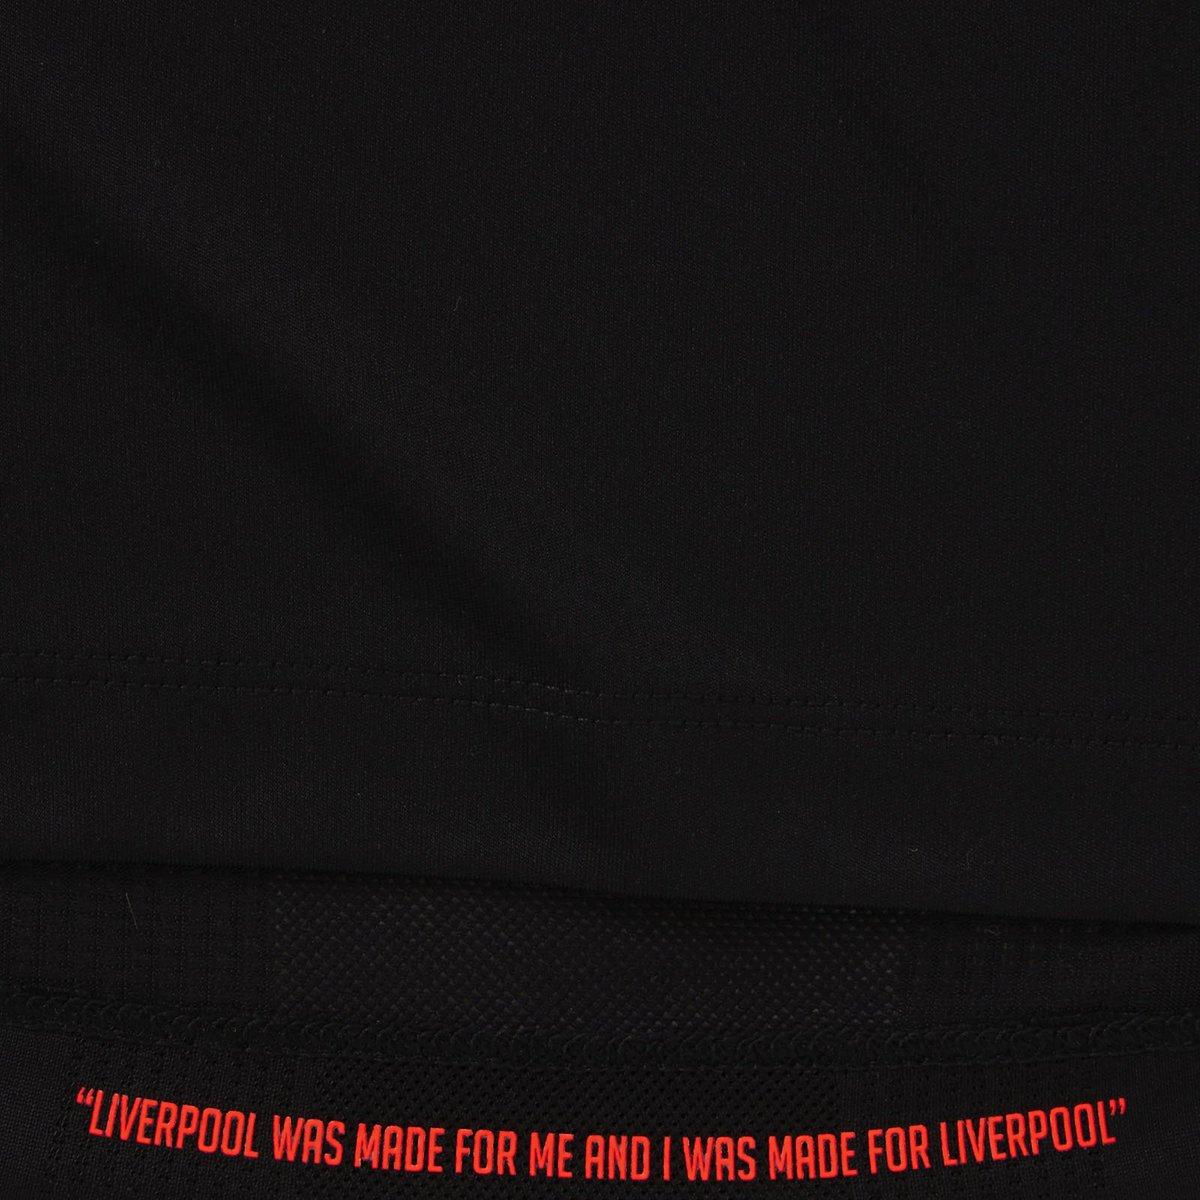 promo code c619f 6d852 Liverpool FC on Twitter: